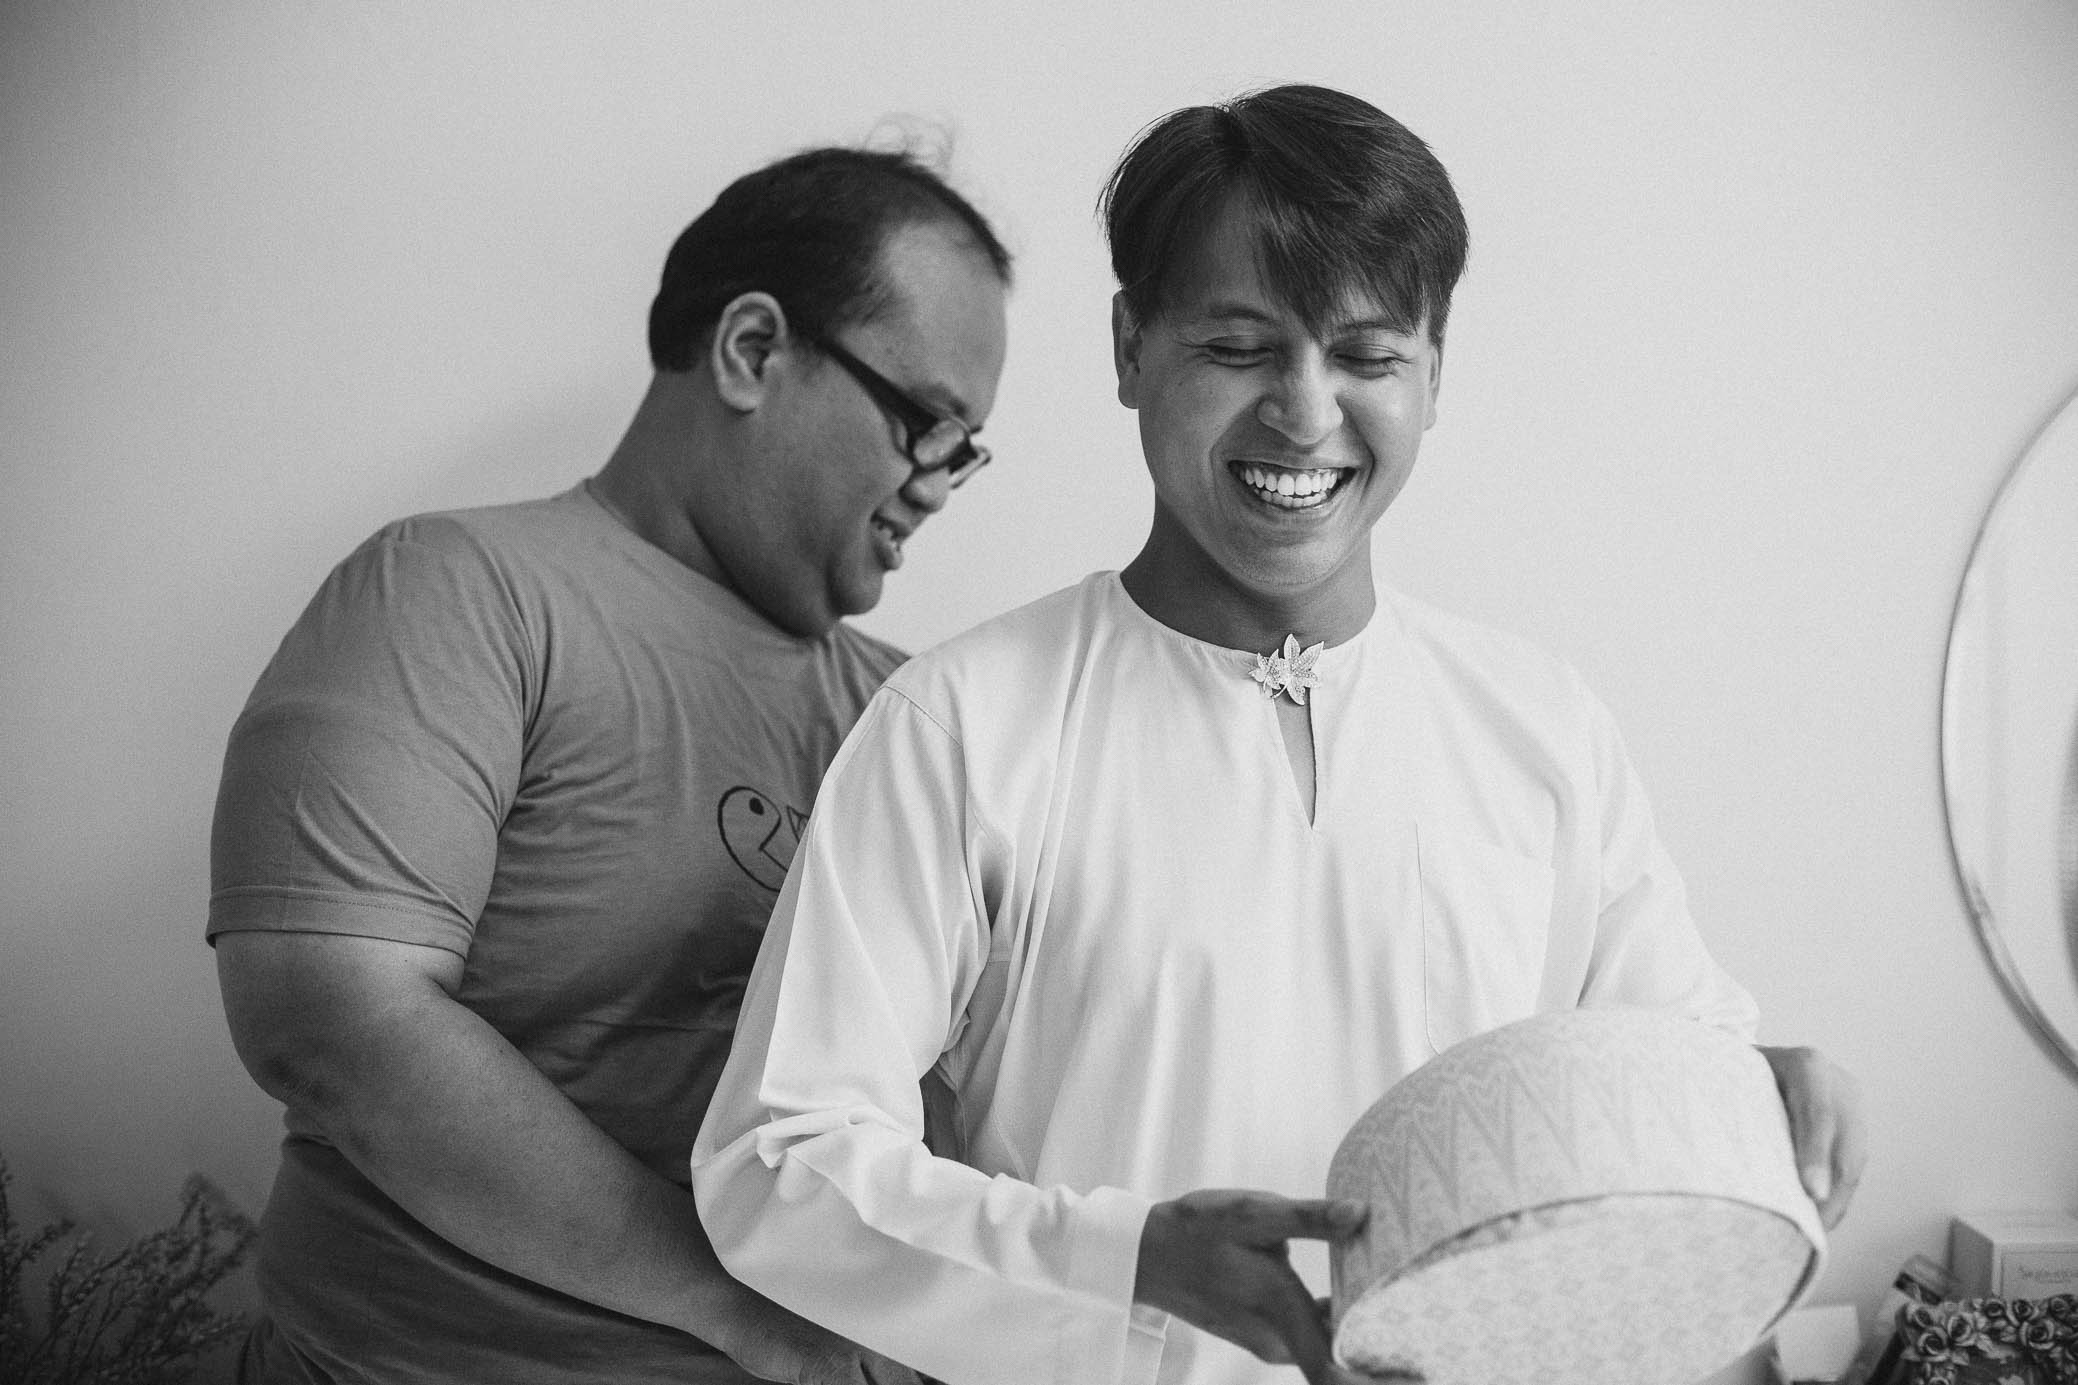 singapore-wedding-photographer-malay-indian-pre-wedding-travel-wmt-2015-alif-ethel-05.jpg